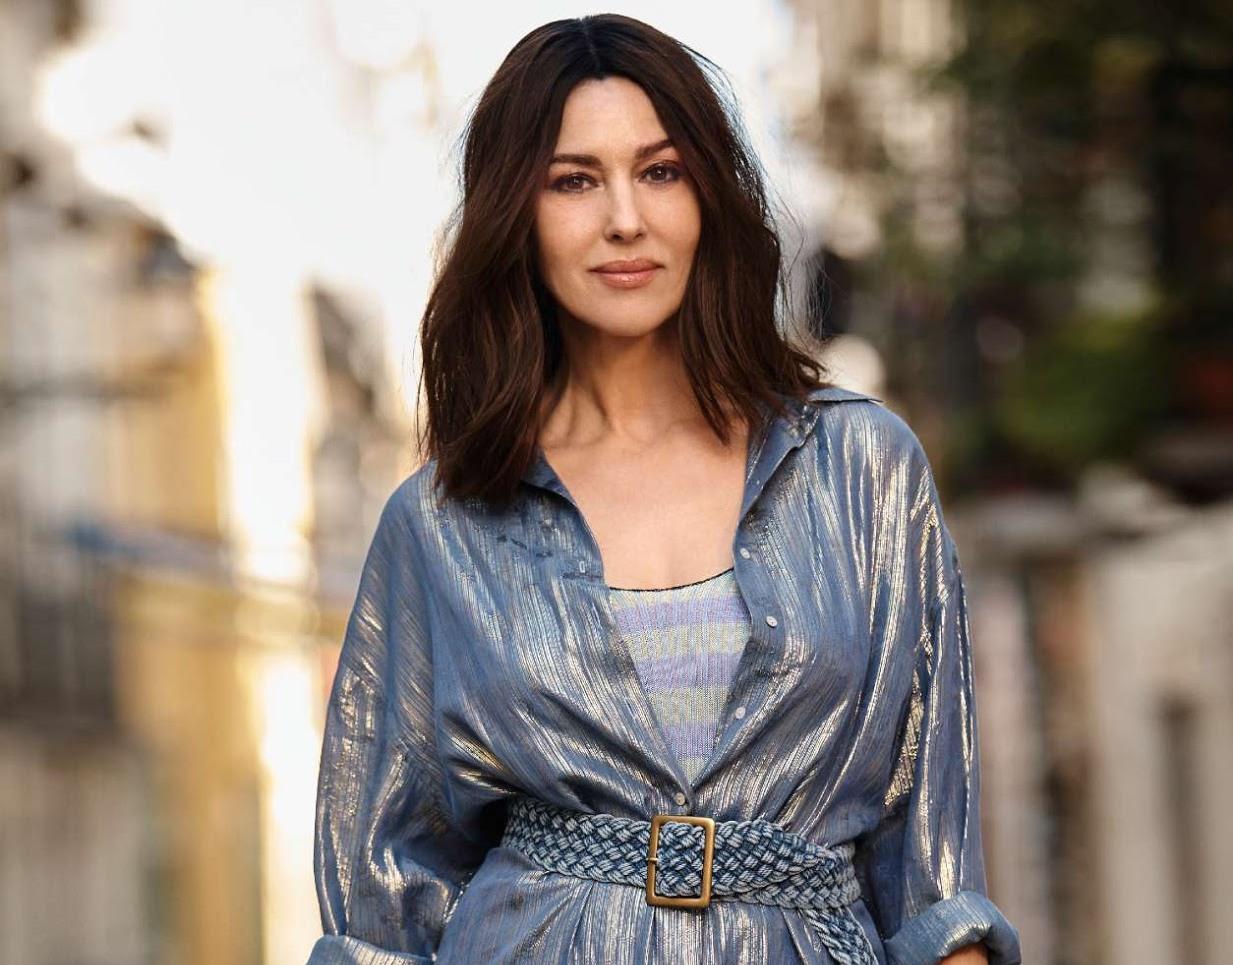 Monica Bellucci by Myro Wulff for ELLE France July 6th, 2018